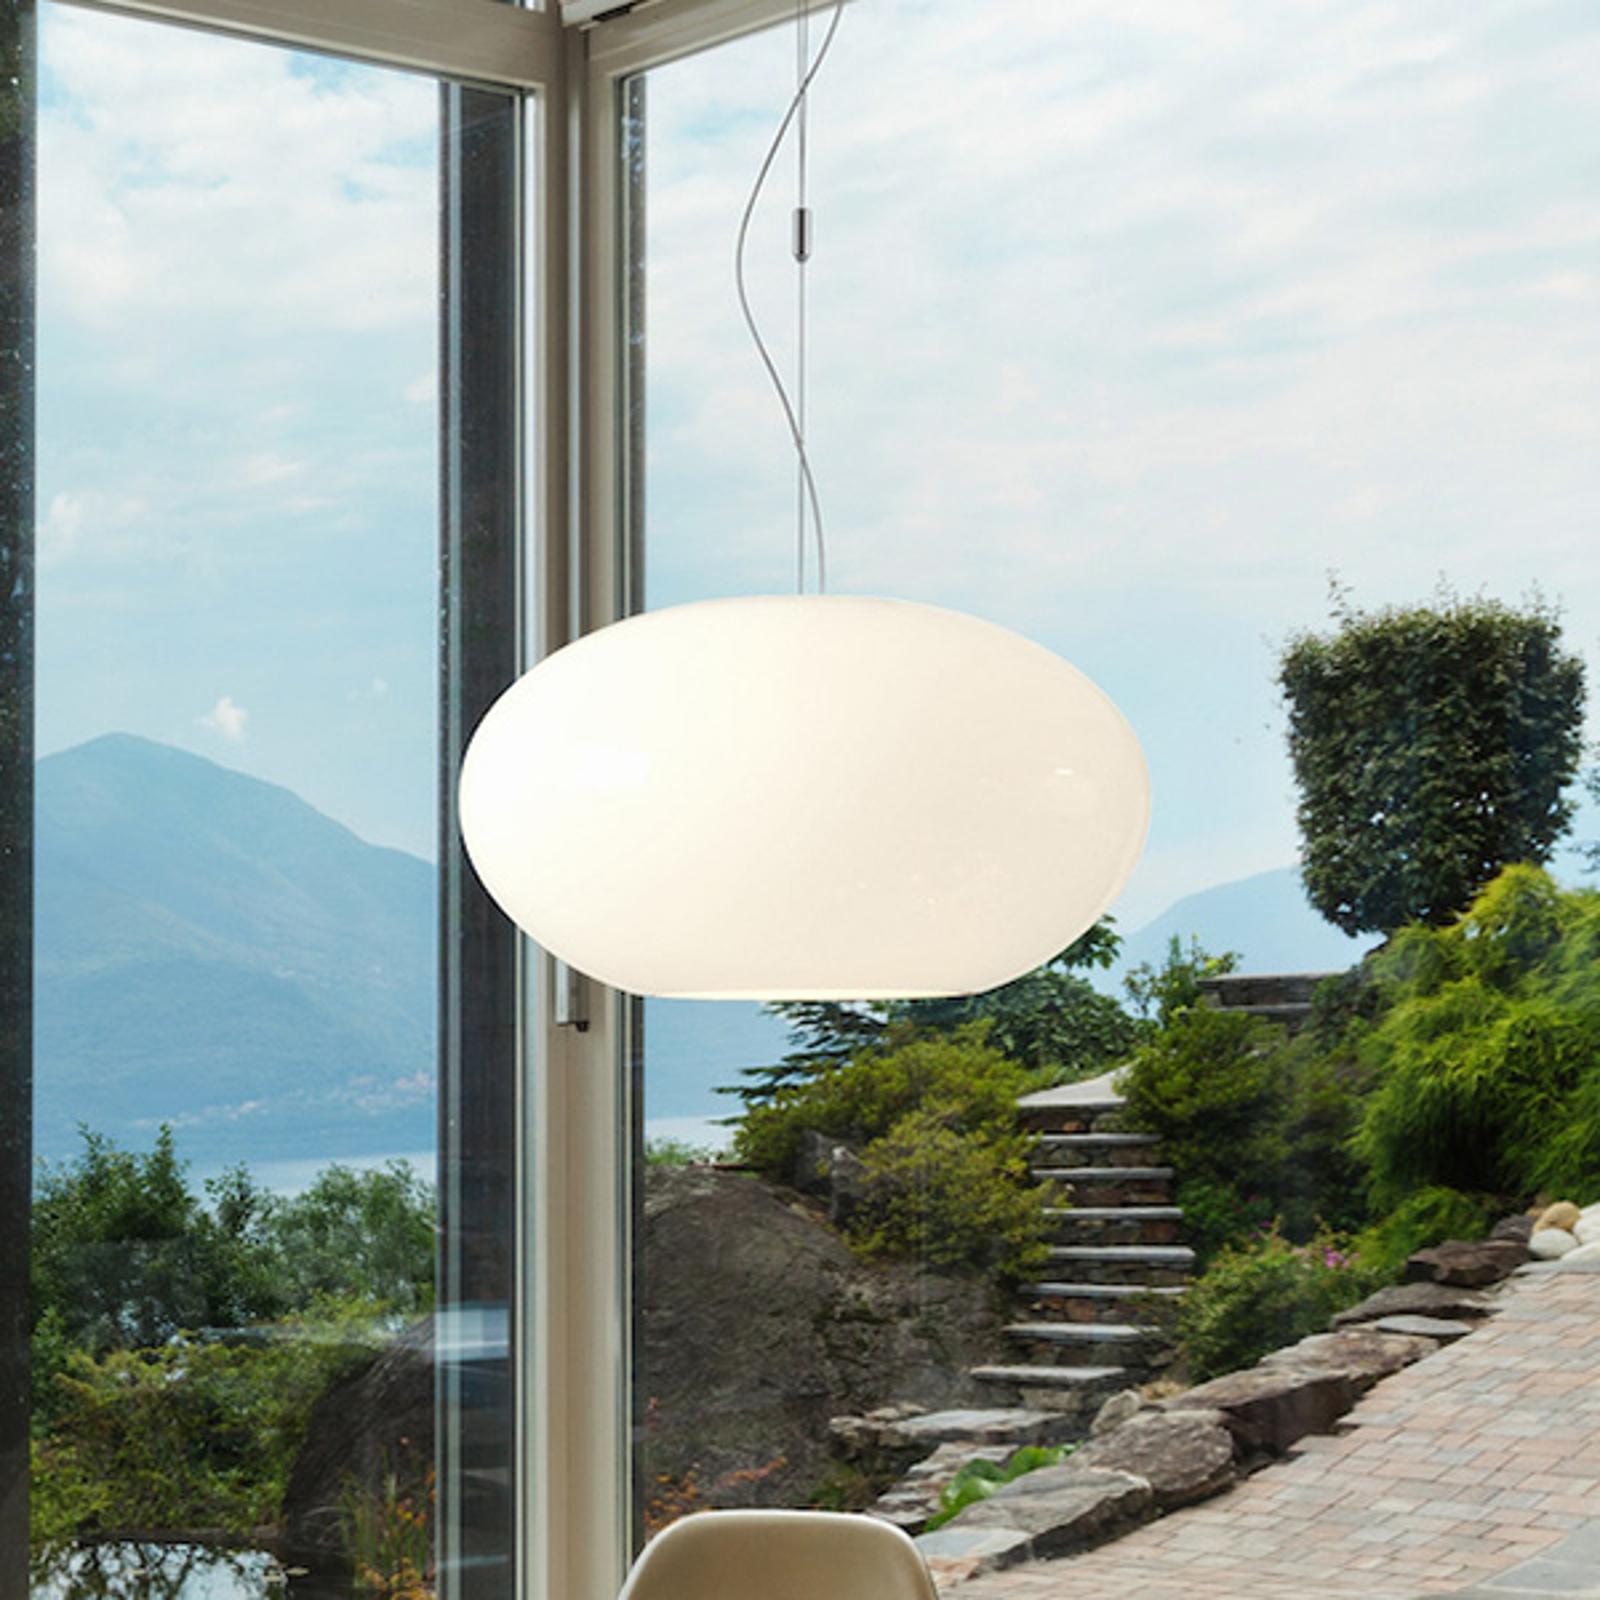 Glass pendant light AIH 38 cm_2000228_1